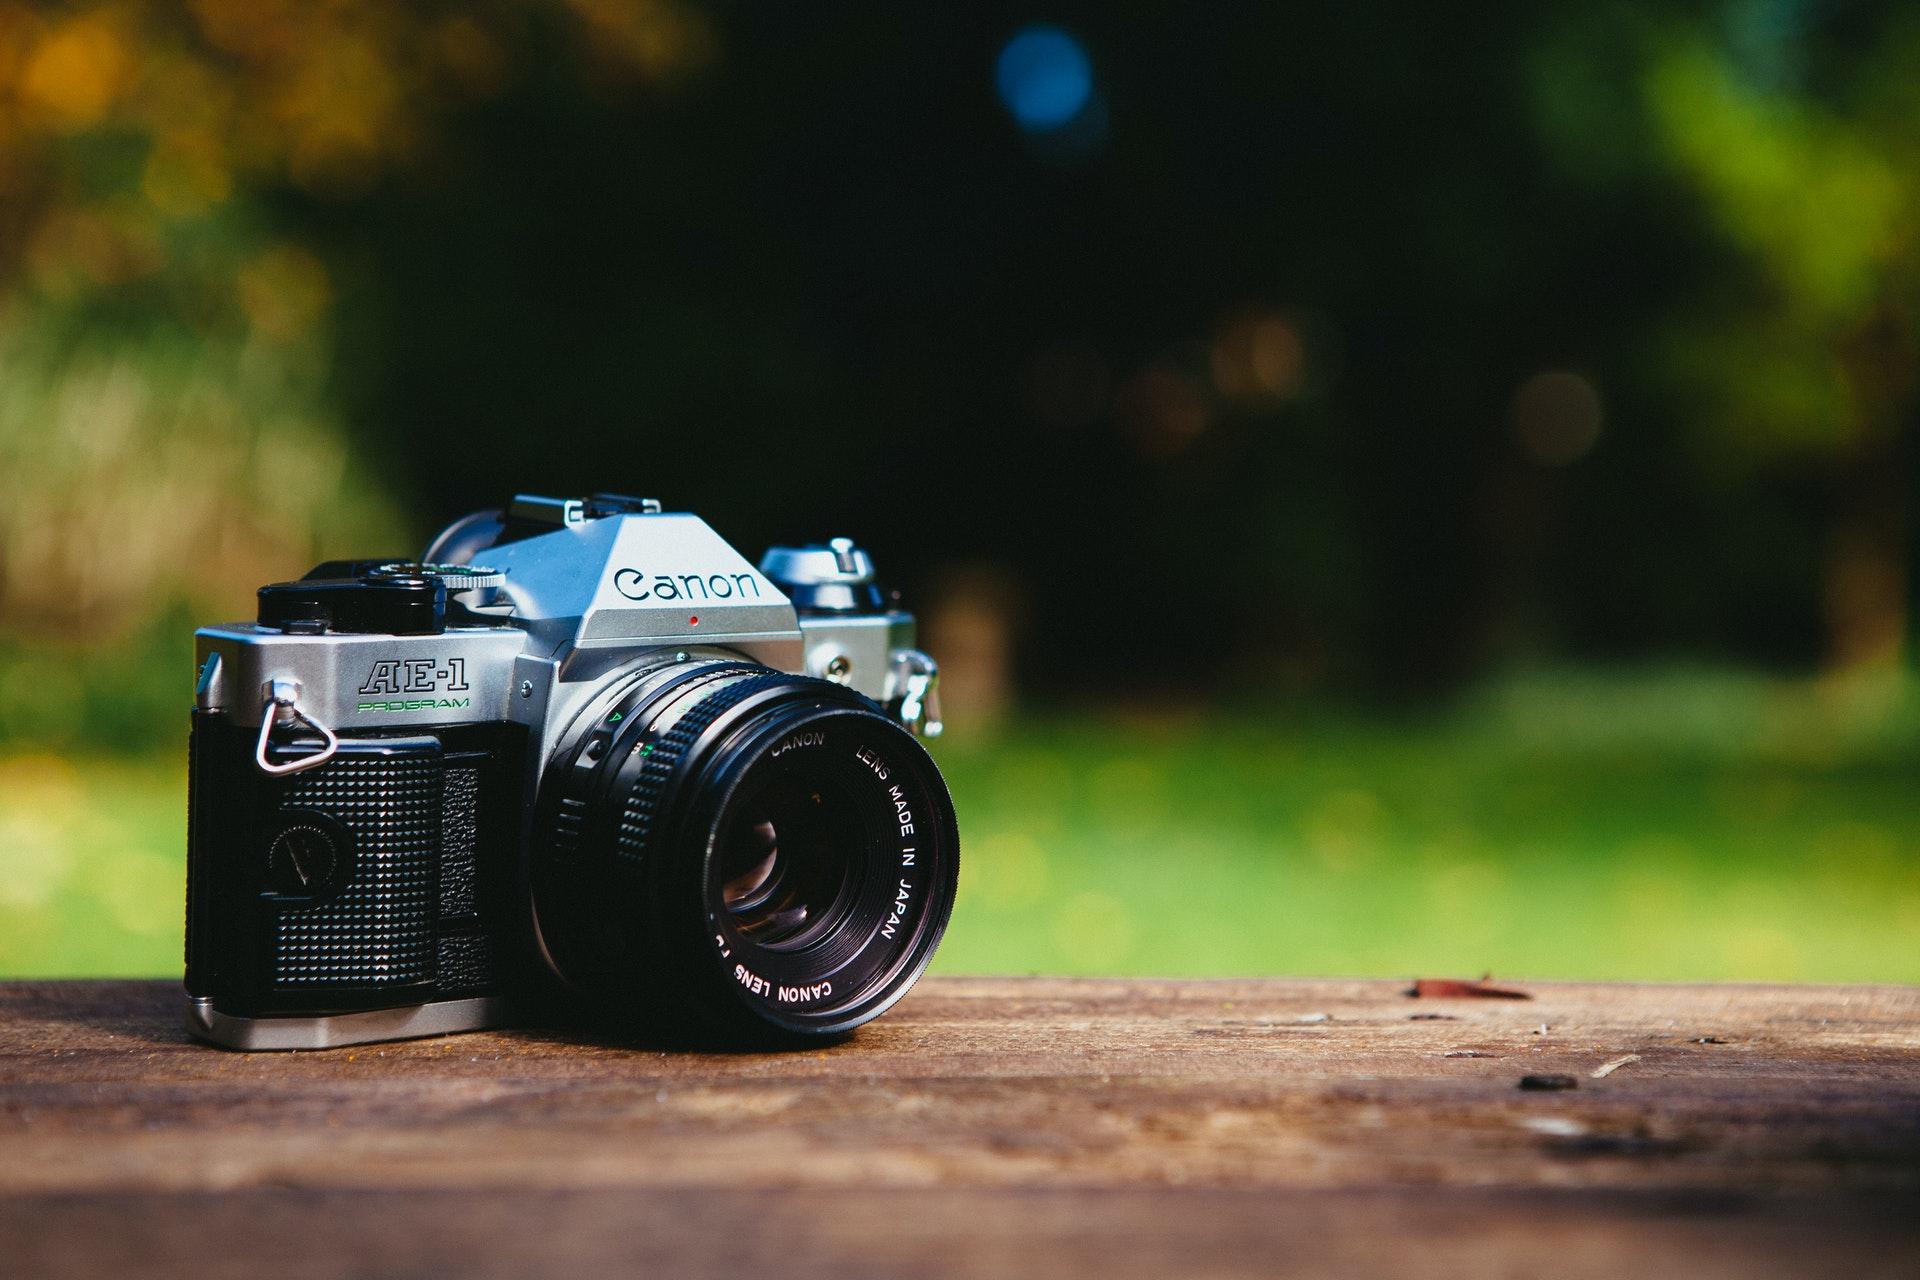 Canon AE-1 (Pic: Little Visuals/Pexels)